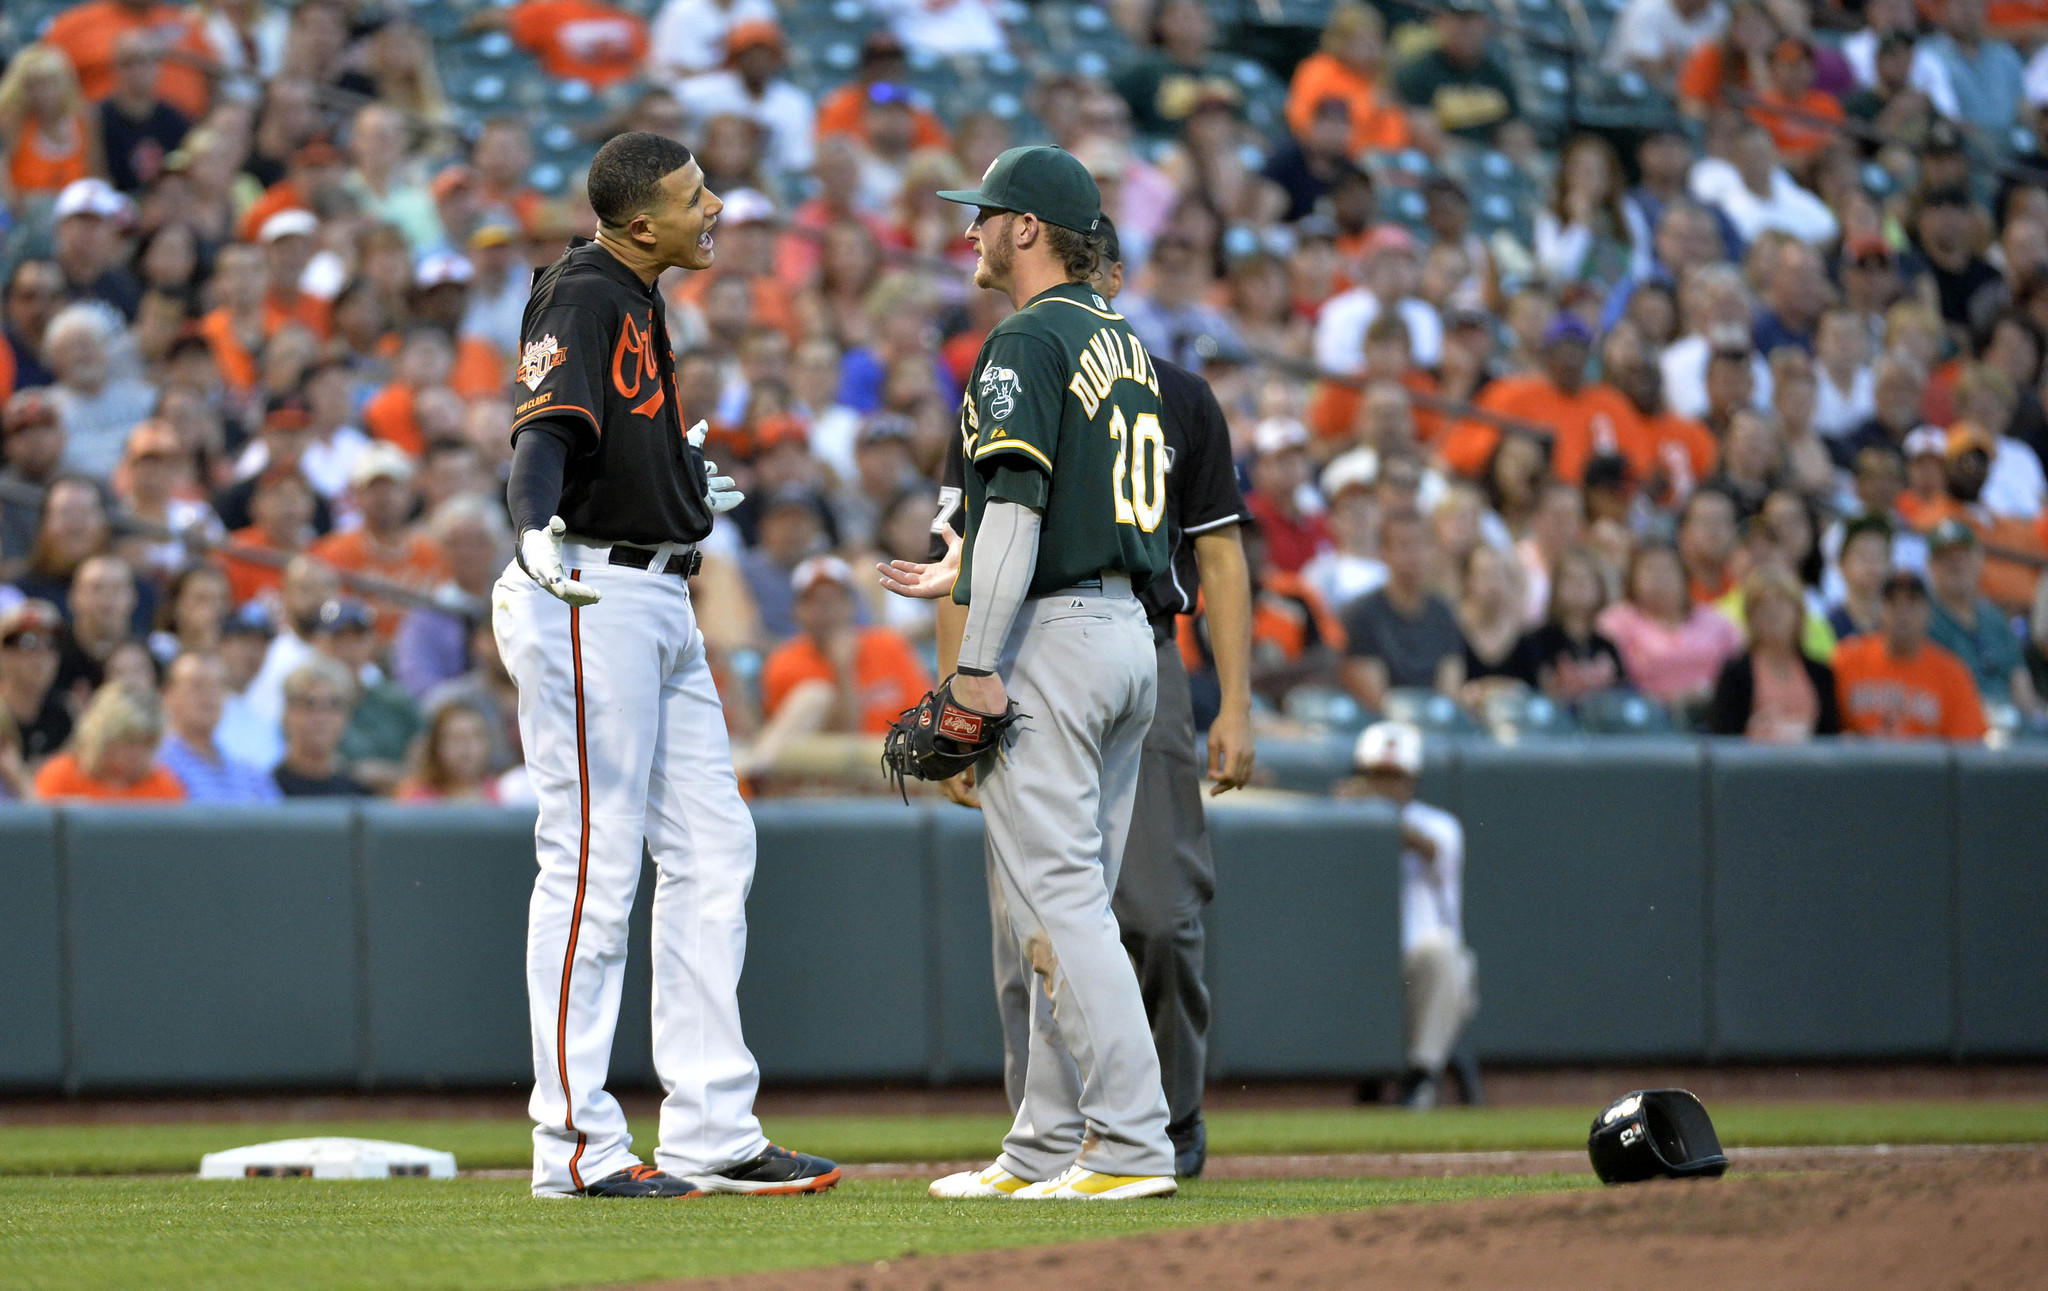 Orioles third baseman Manny Machado argues with Oakland Athletics third baseman Josh Donaldson in June.